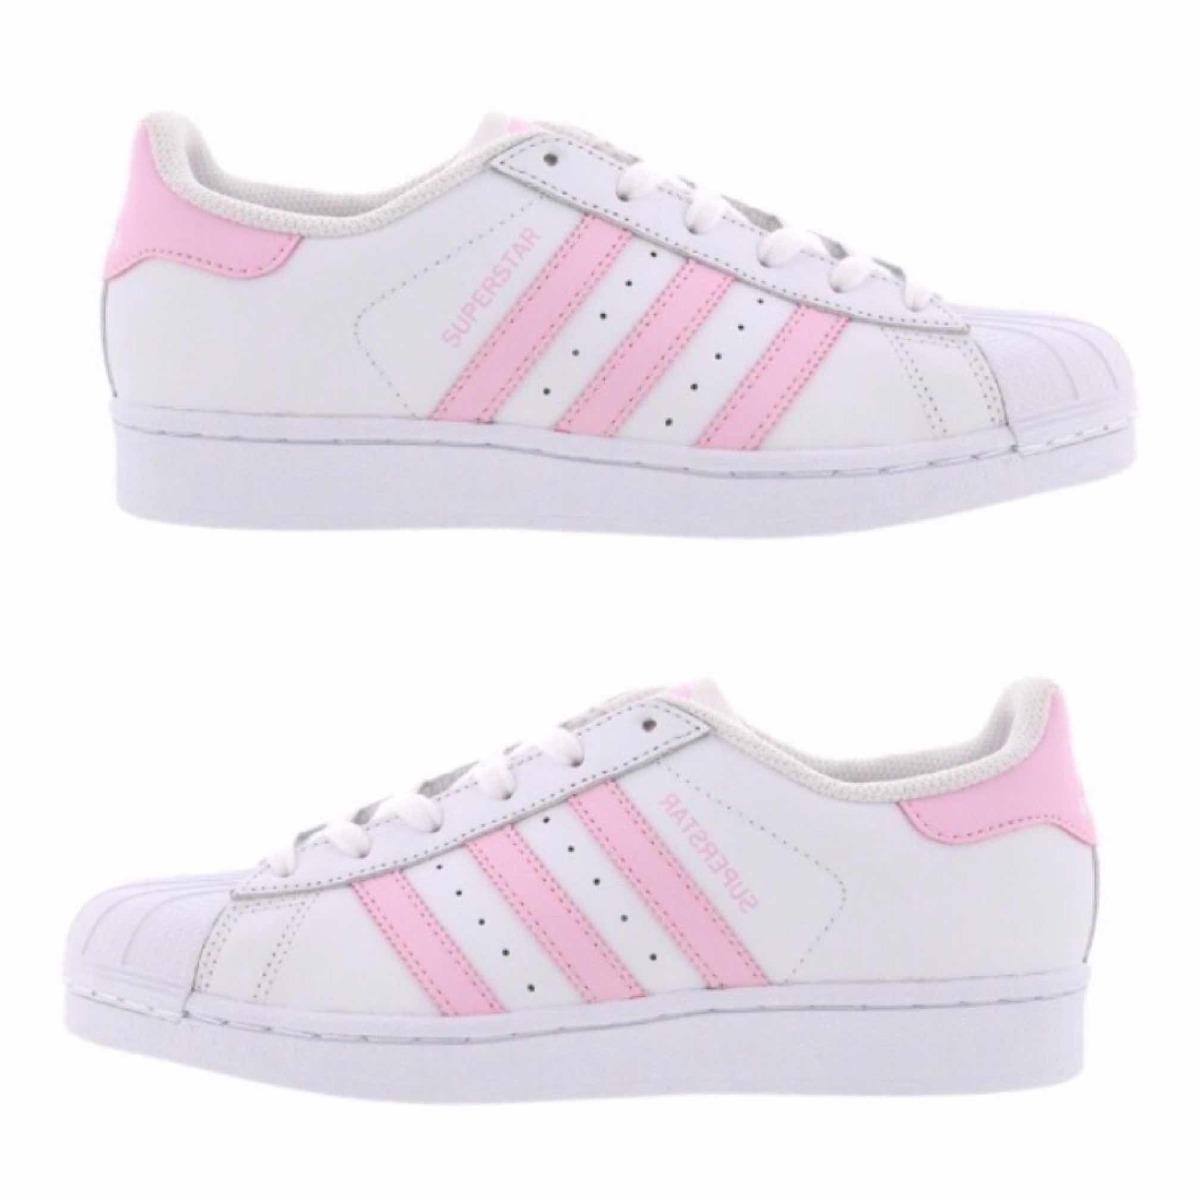 adidas superstar mujer segunda mano,adidas rosas pastel